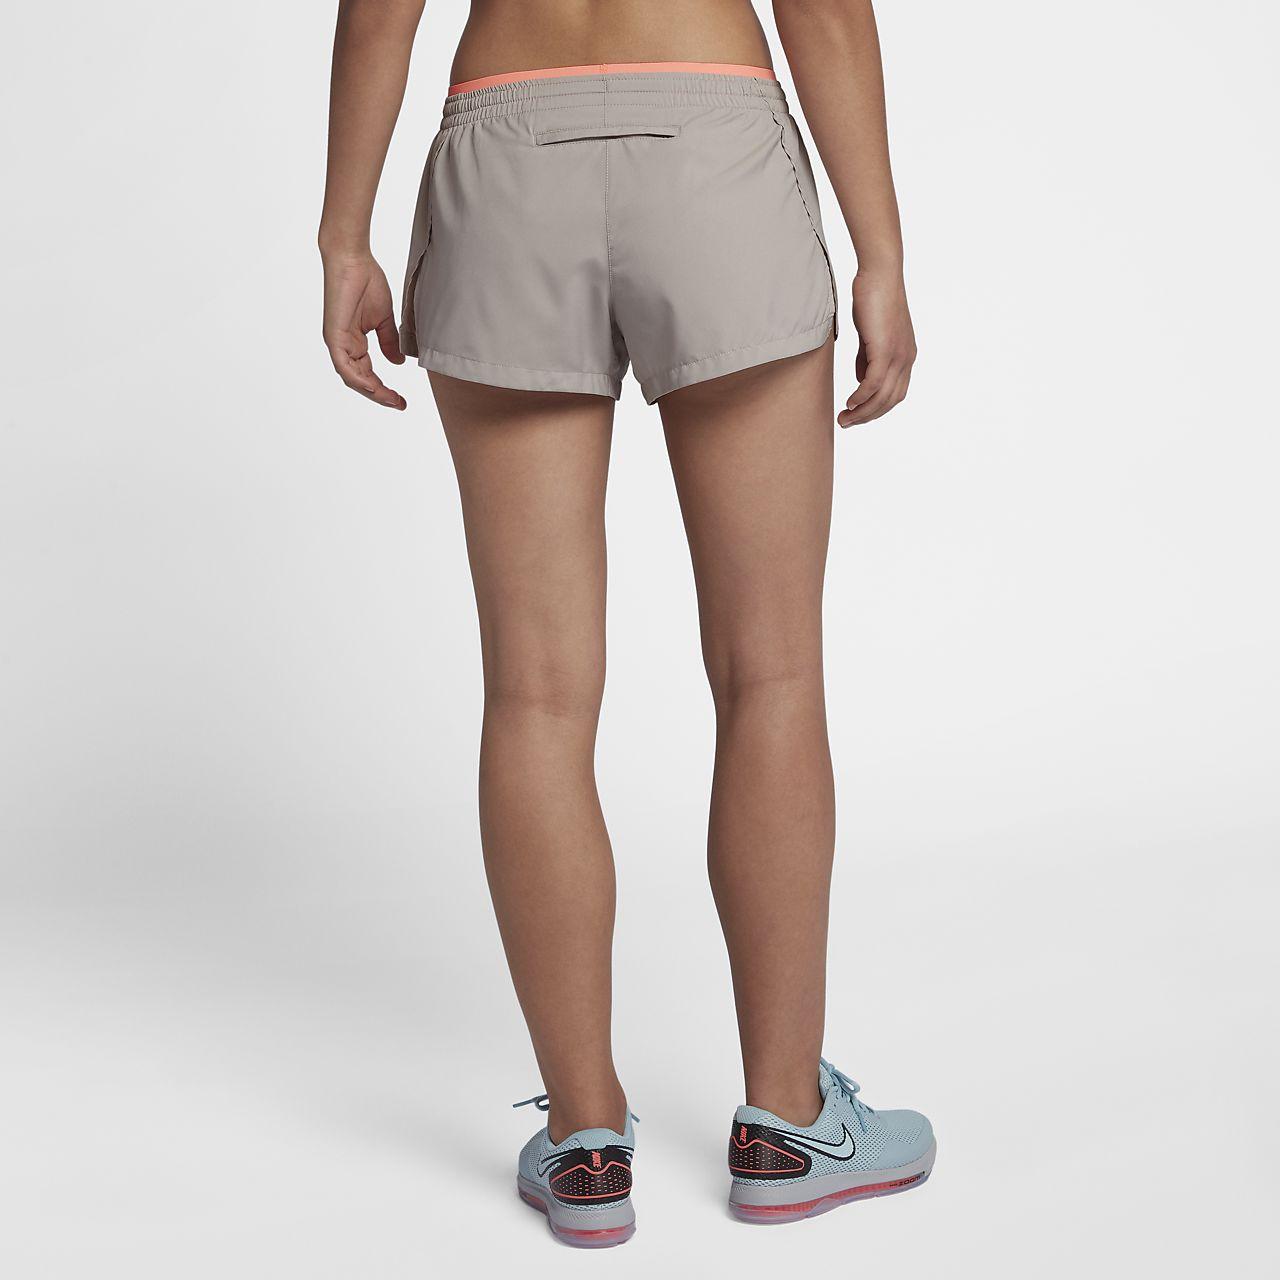 Elevate für Damen Laufshorts Track Nike DbeH2W9IYE